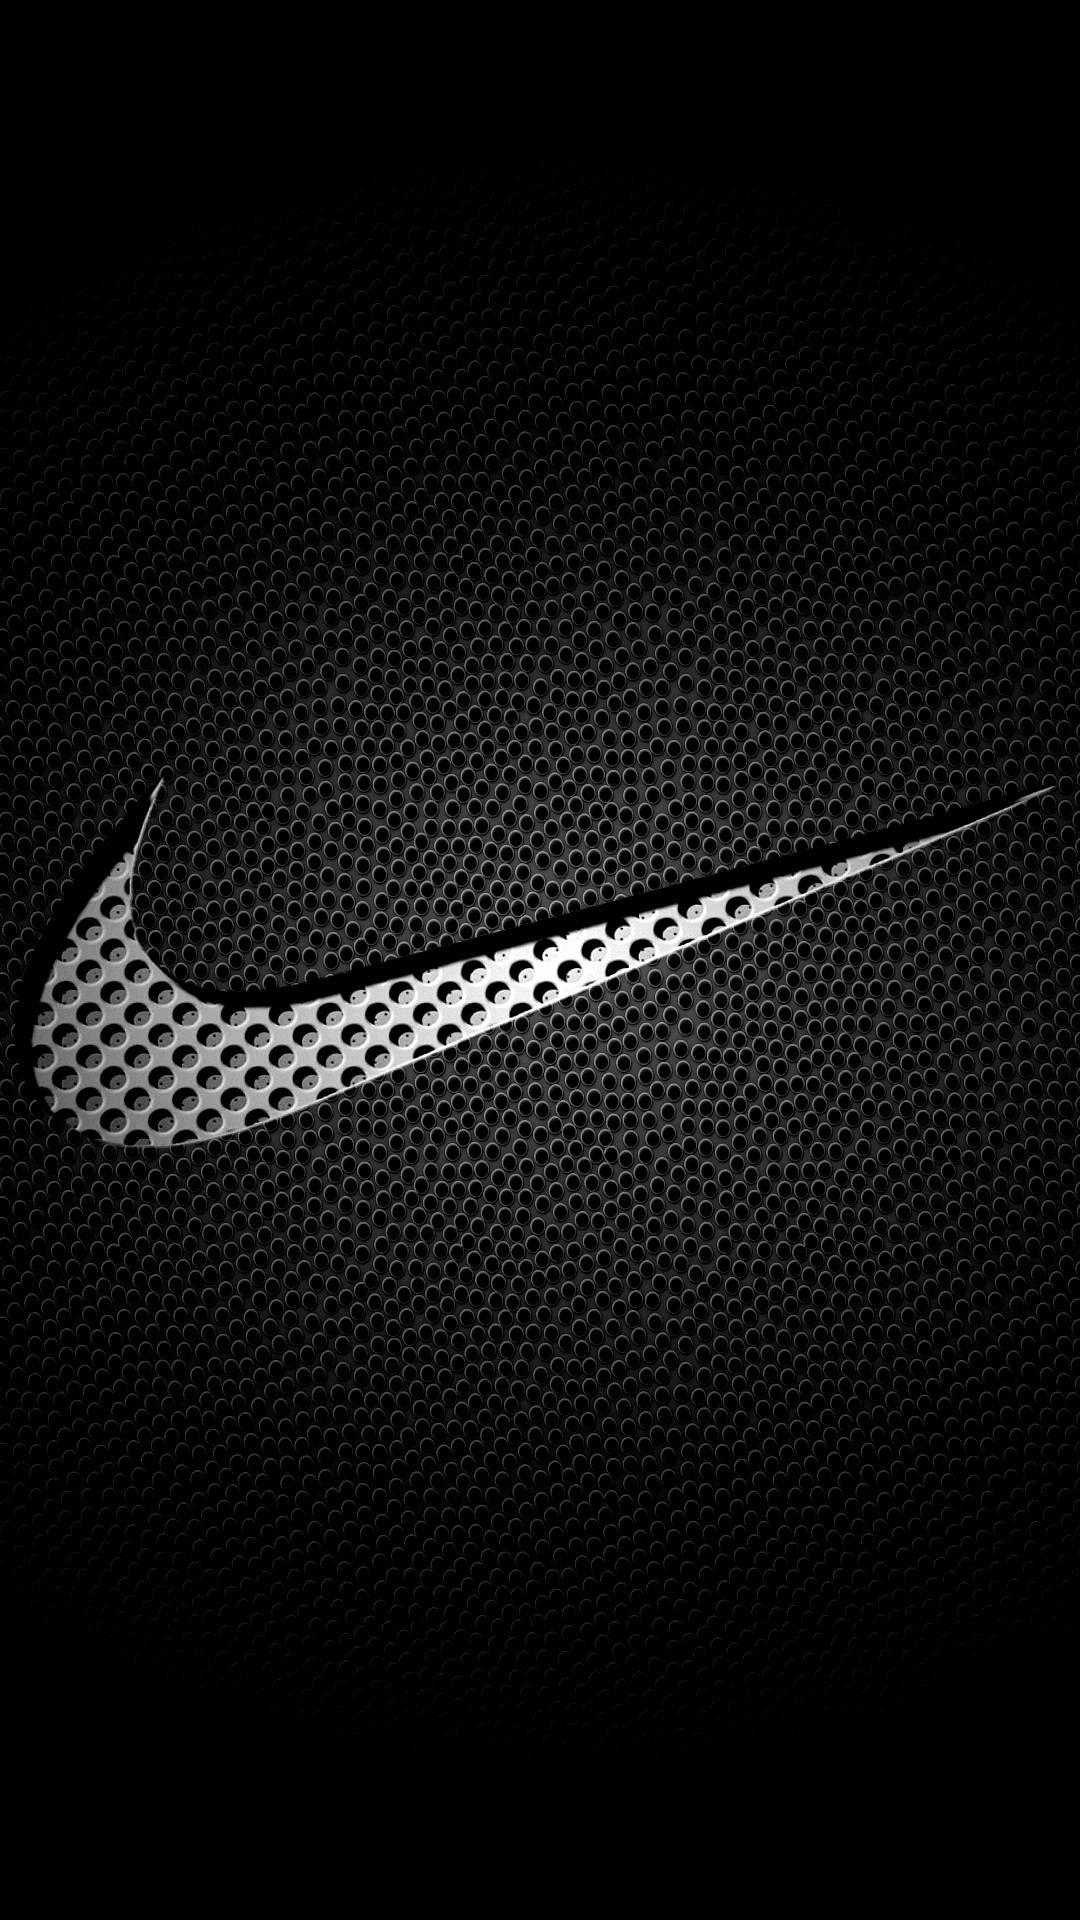 Muchatseble Nike Wallpaper Nike Wallpaper Iphone Nike Logo Wallpapers